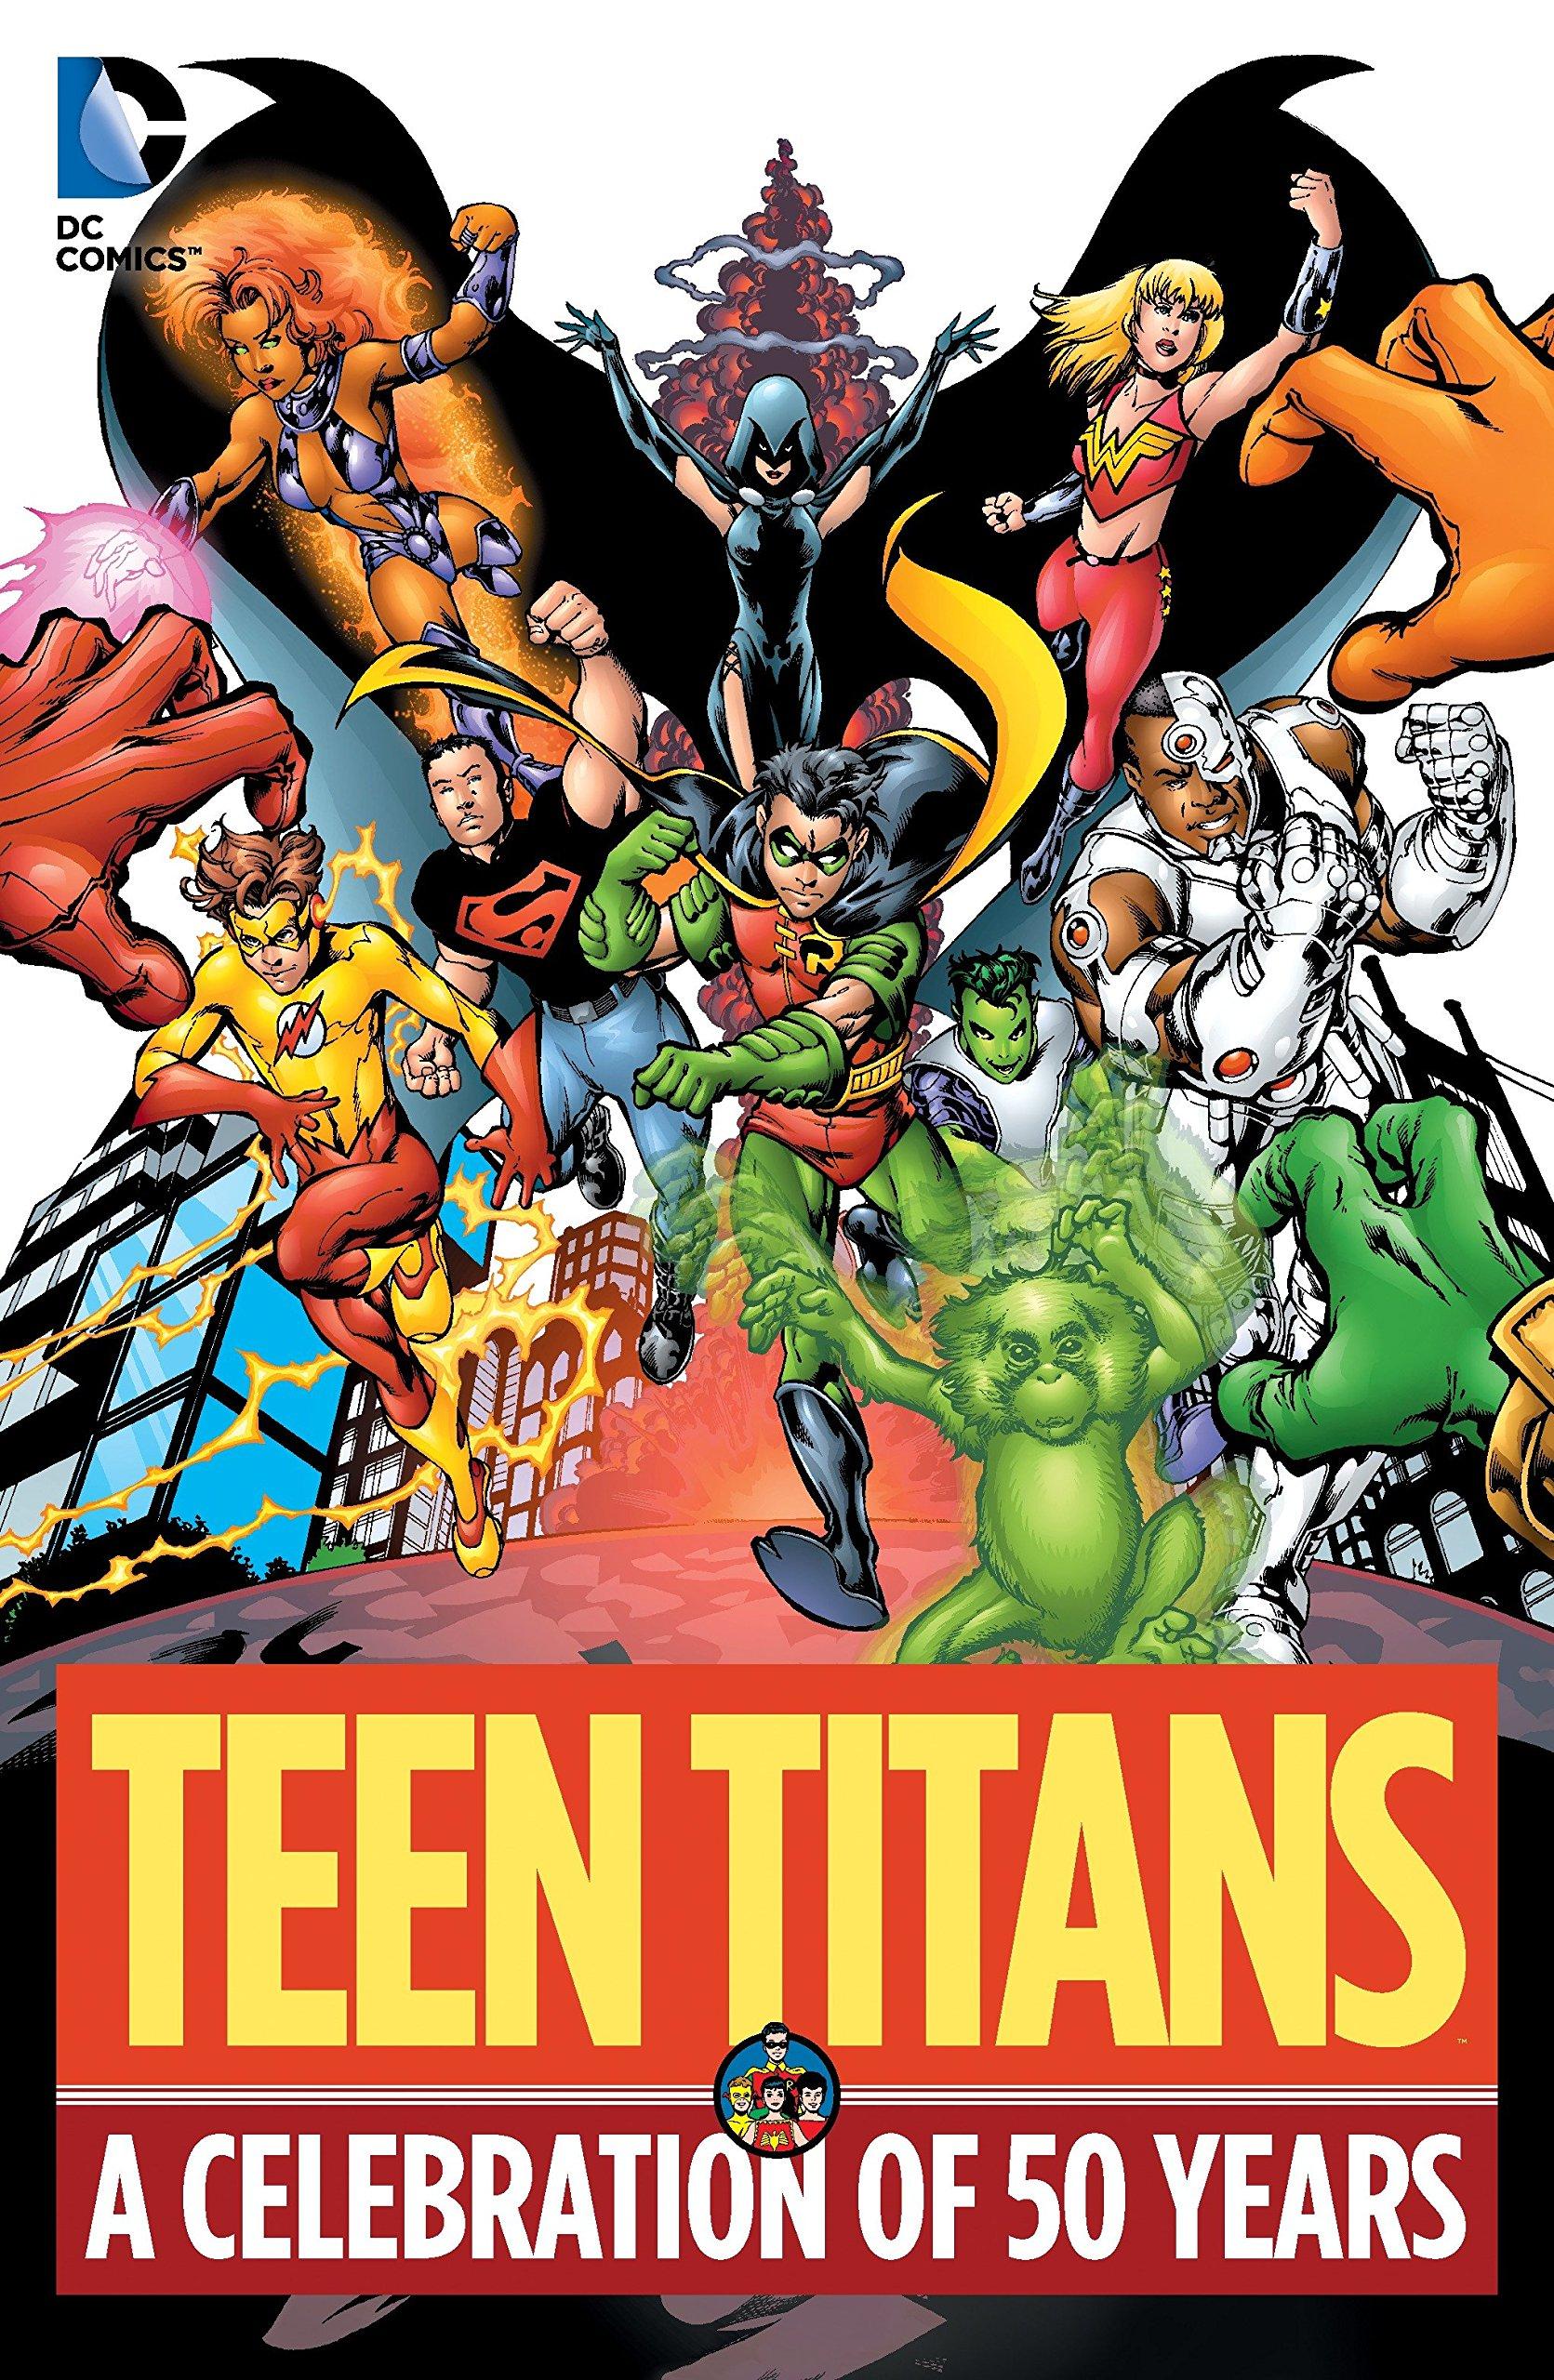 Screenwriter loves teen titans comics